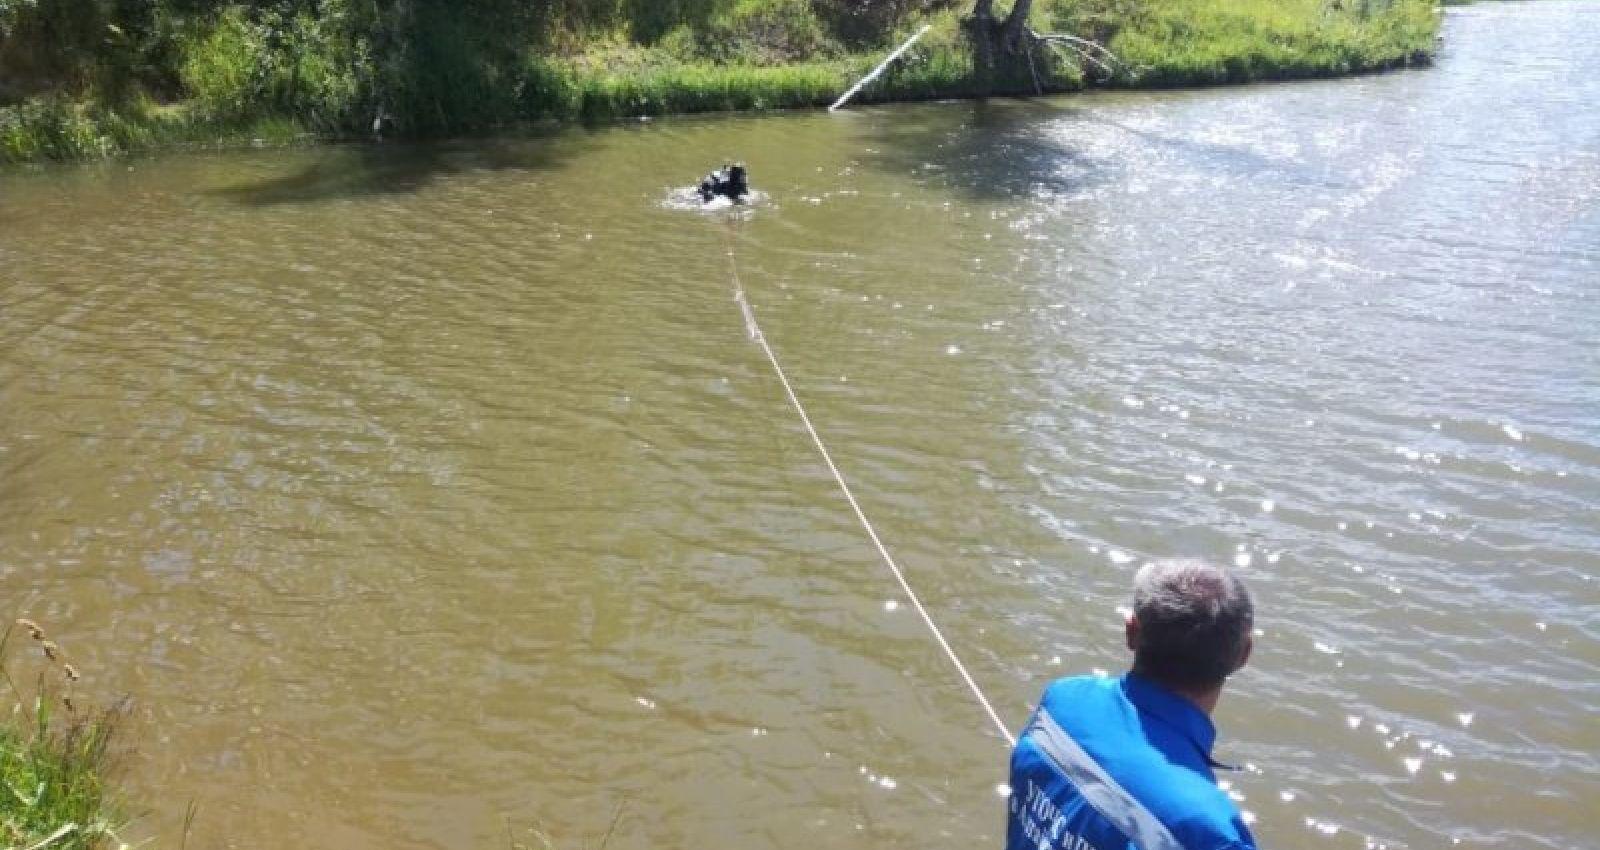 Спасатели завершили поиски девочки в Заринске